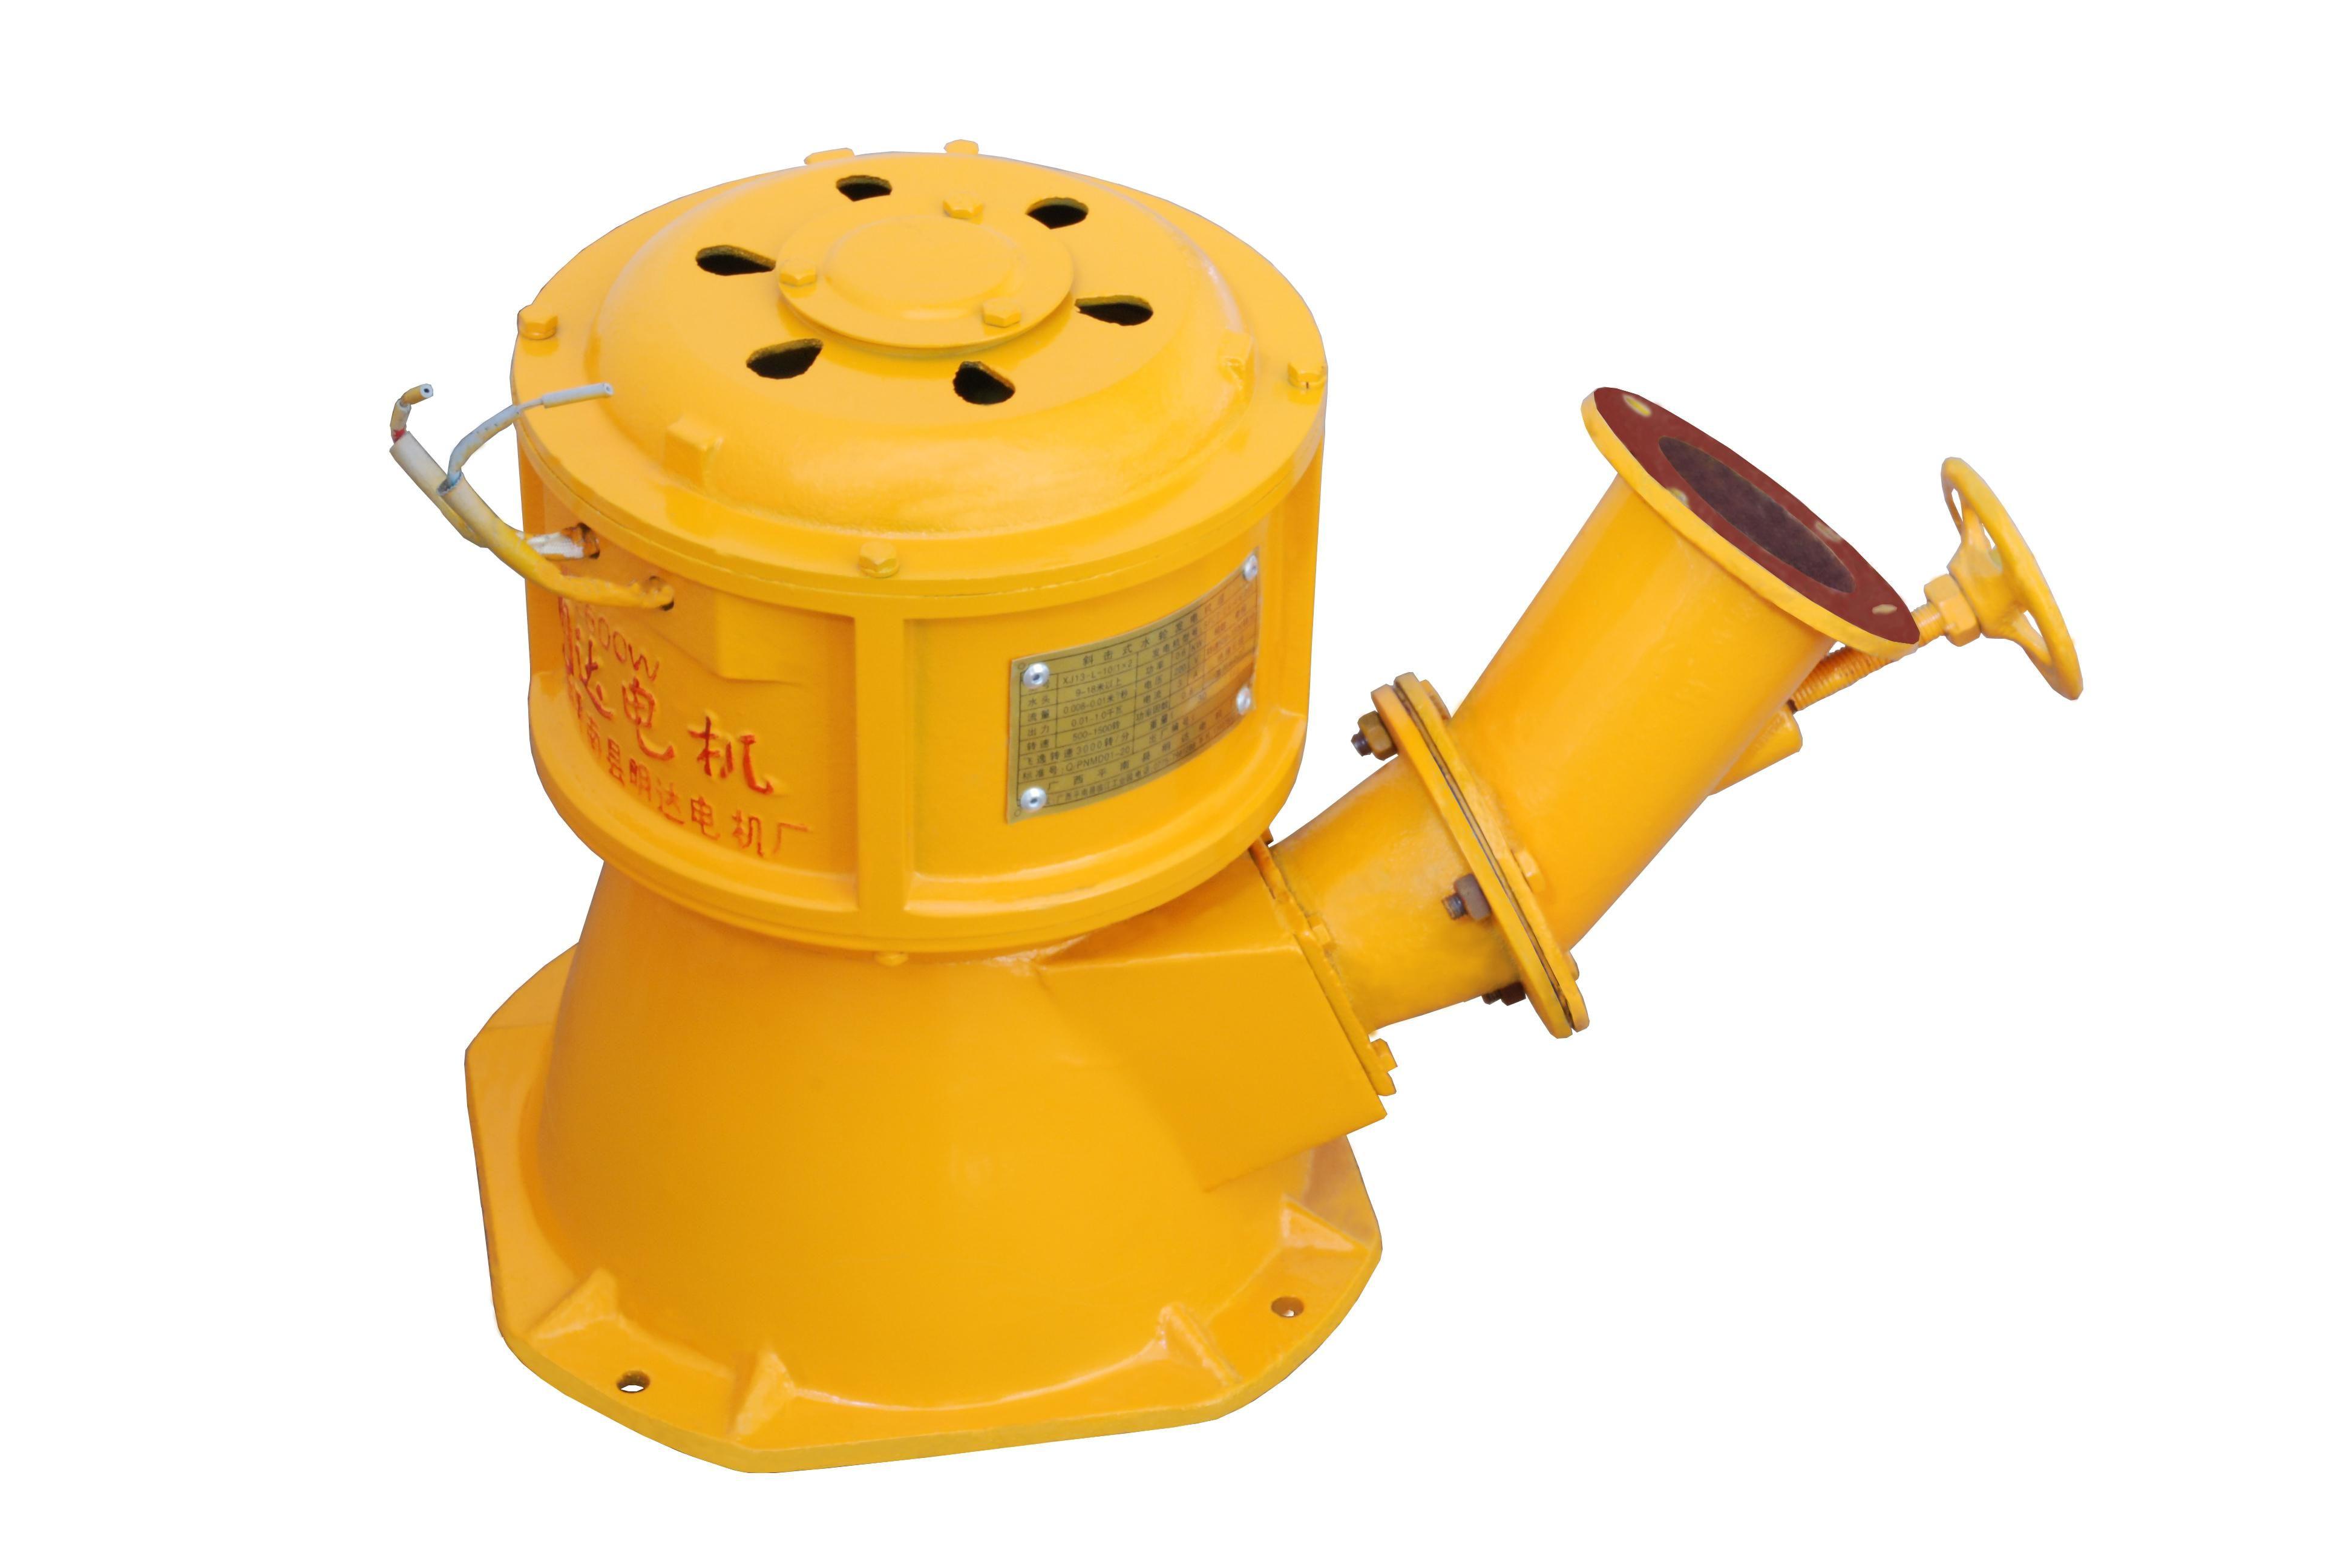 2018 Small Hydro Water Turbine Generator Types Turgo Kaplan